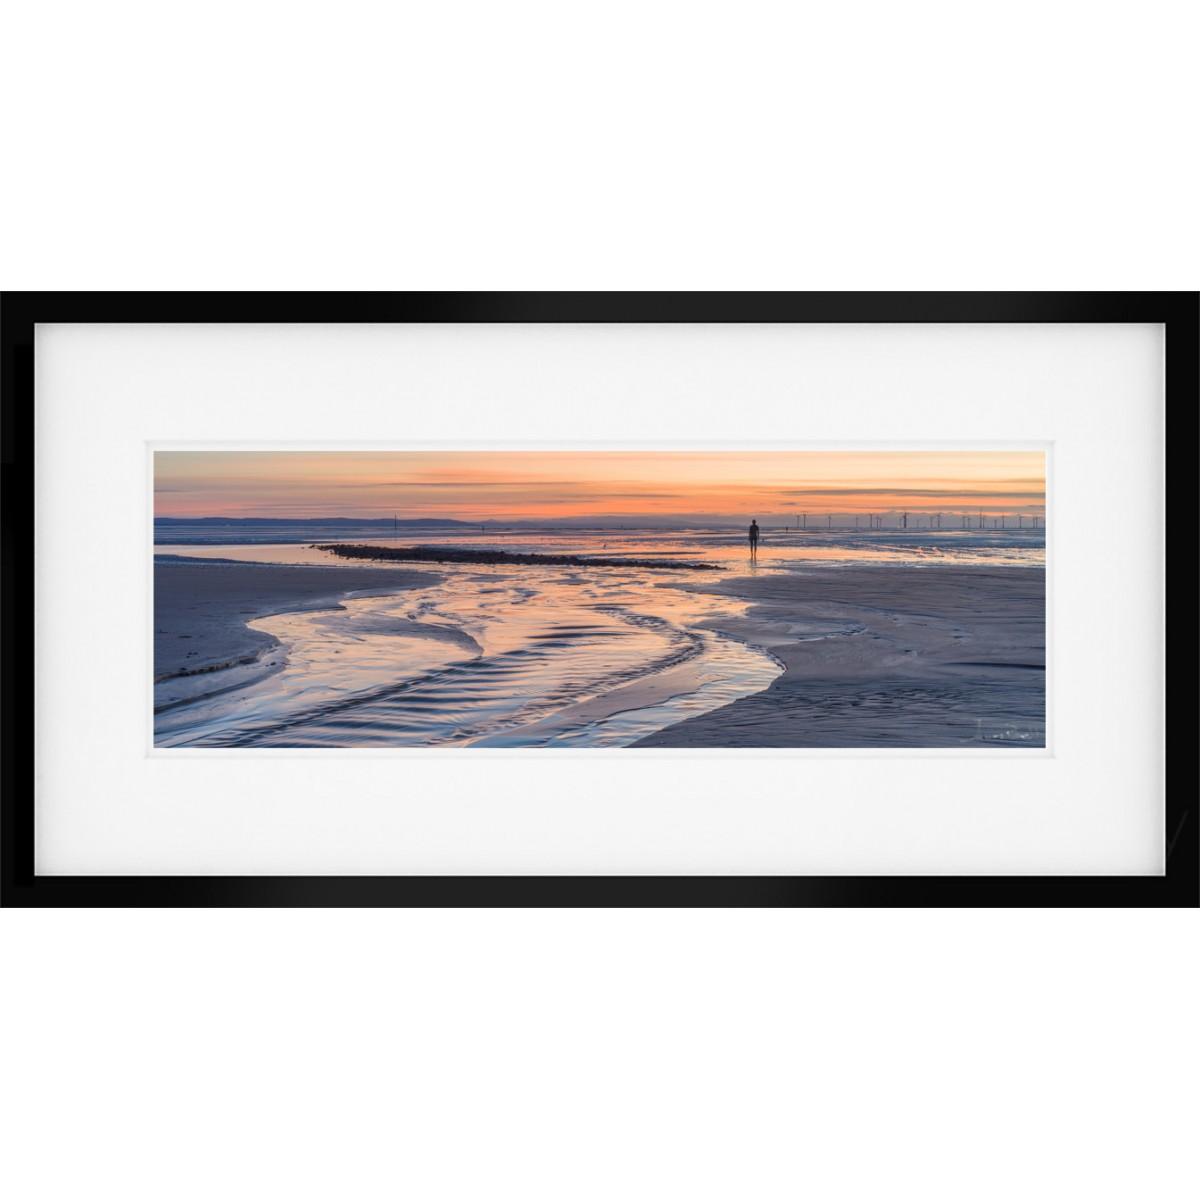 Crosby Beach Sunset Vista Framed print